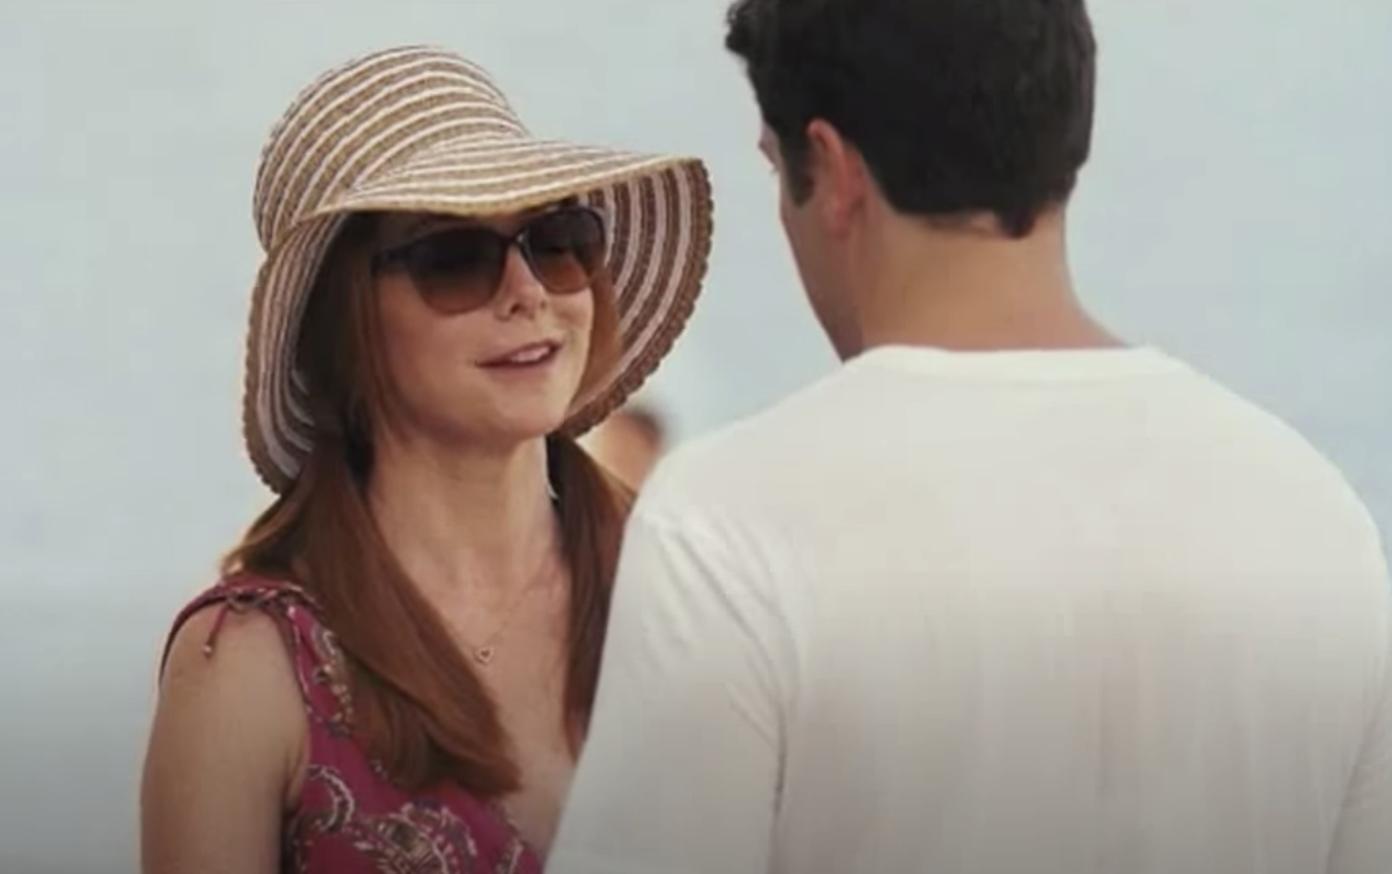 Alyson Hannigan in the film